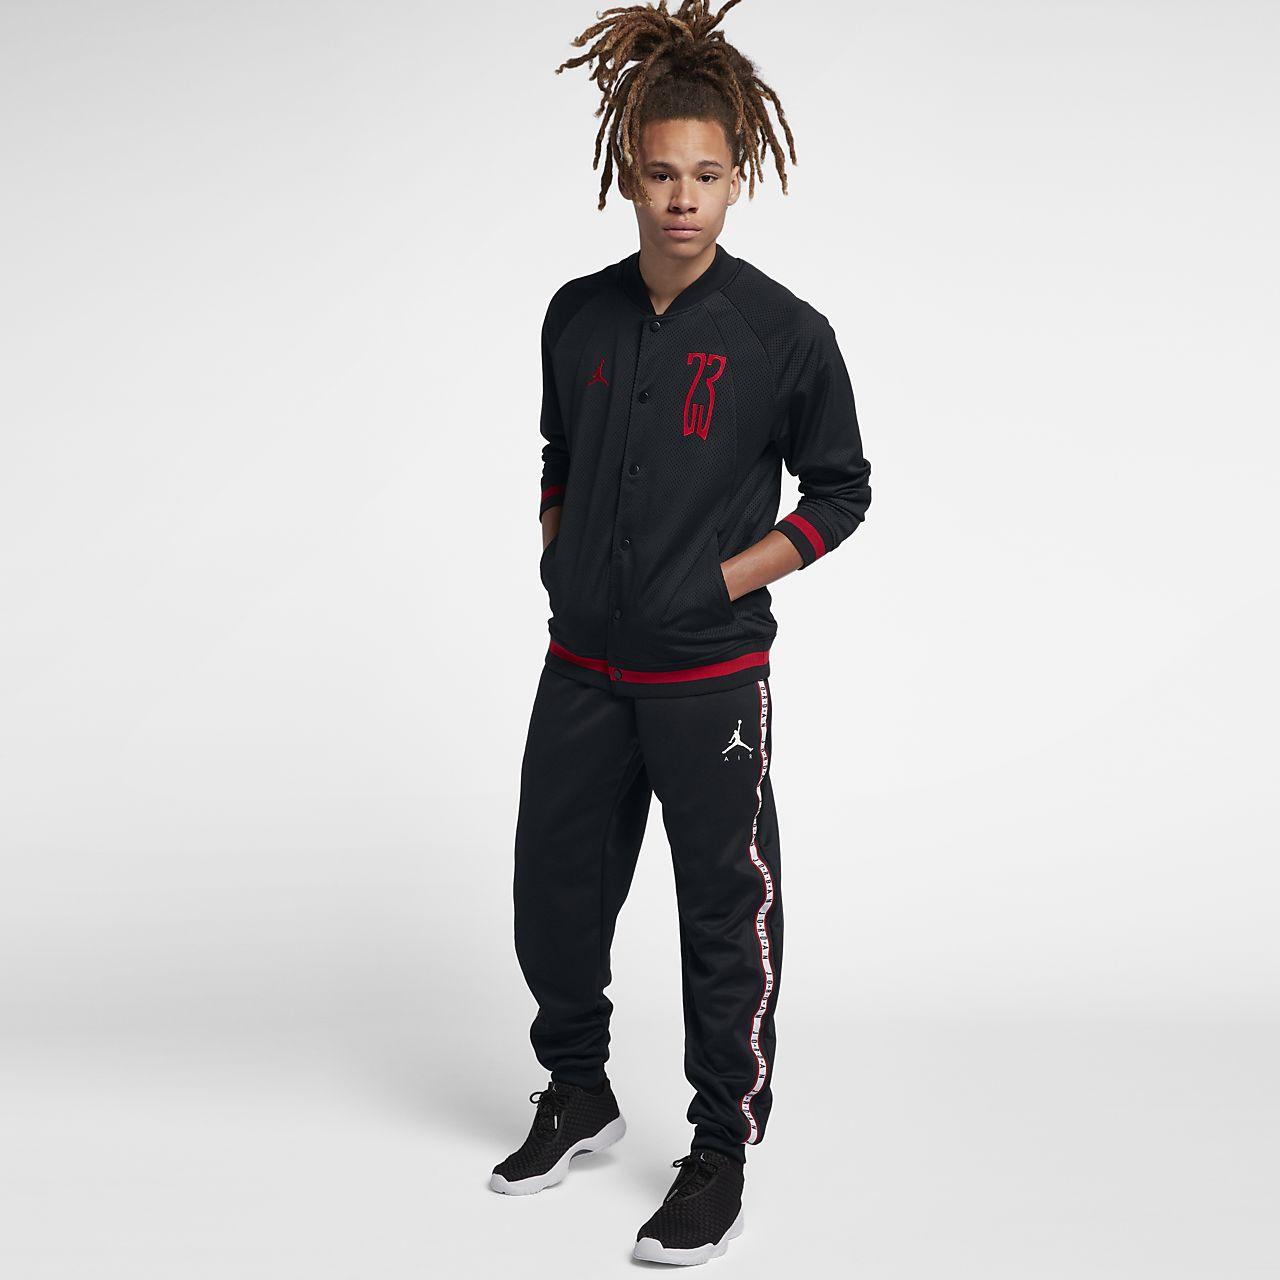 Low Resolution Jordan Lifestyle Jumpman Men s Trousers Jordan Lifestyle  Jumpman Men s Trousers d5c85da2df5